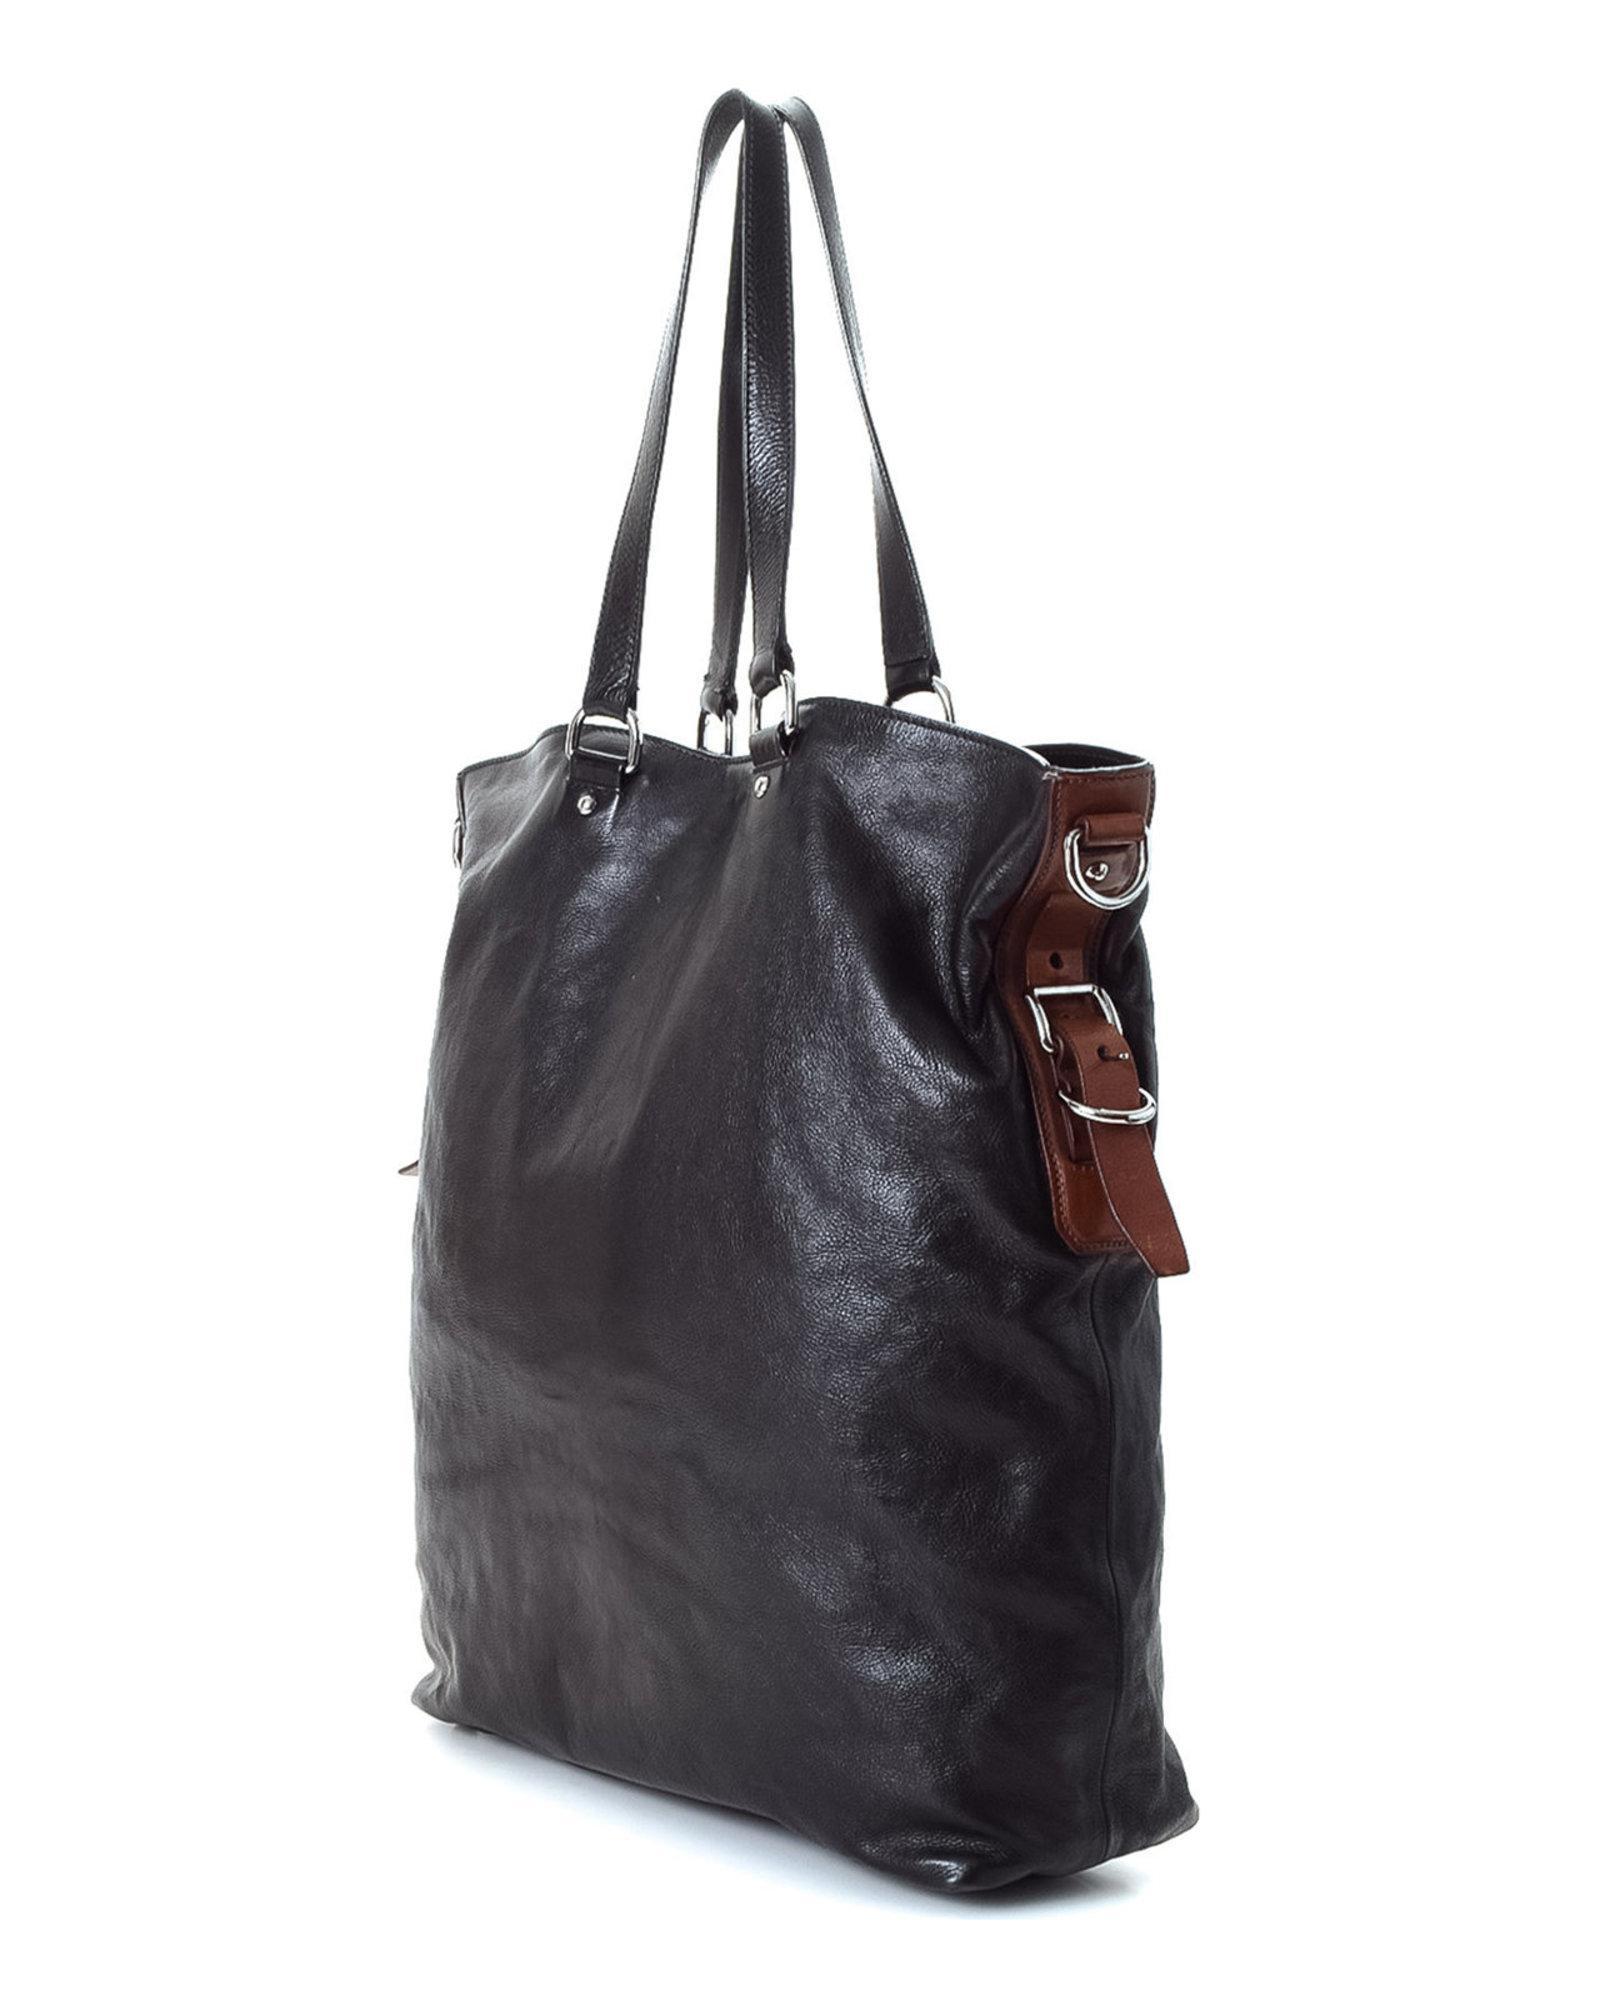 fcc6bec13793 Lyst - Prada Vitello Two Way Tote - Vintage in Black